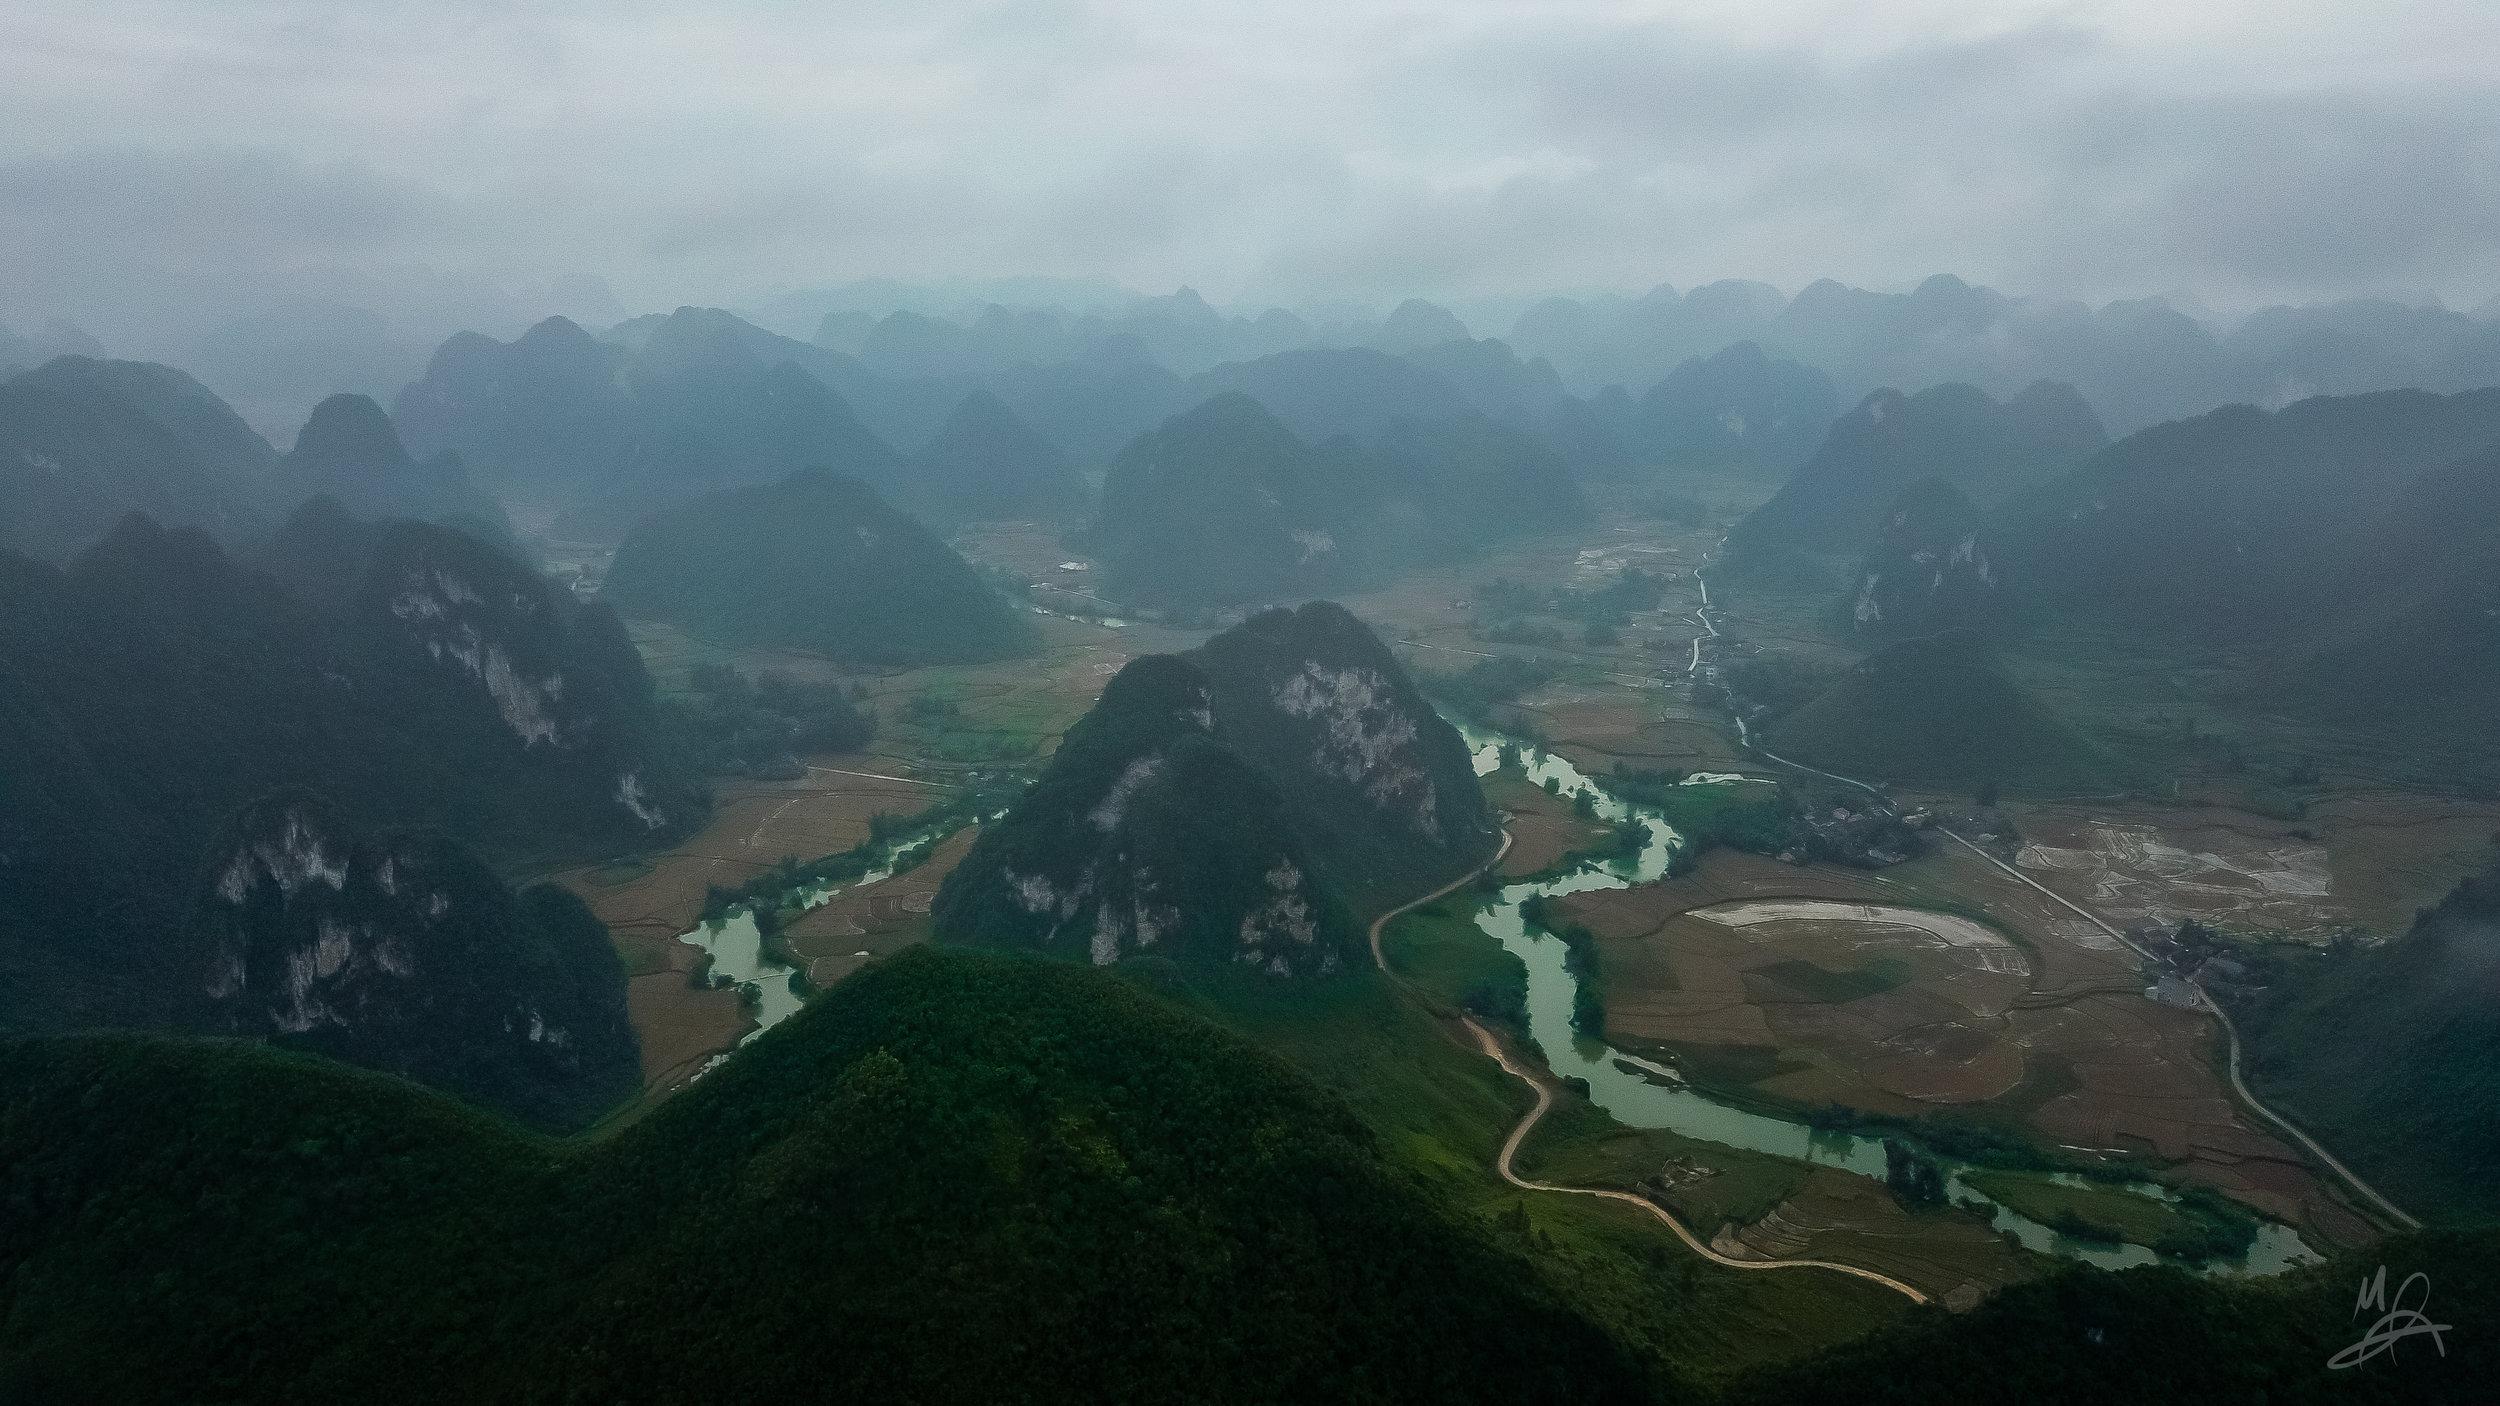 Mountains of Cao Bang